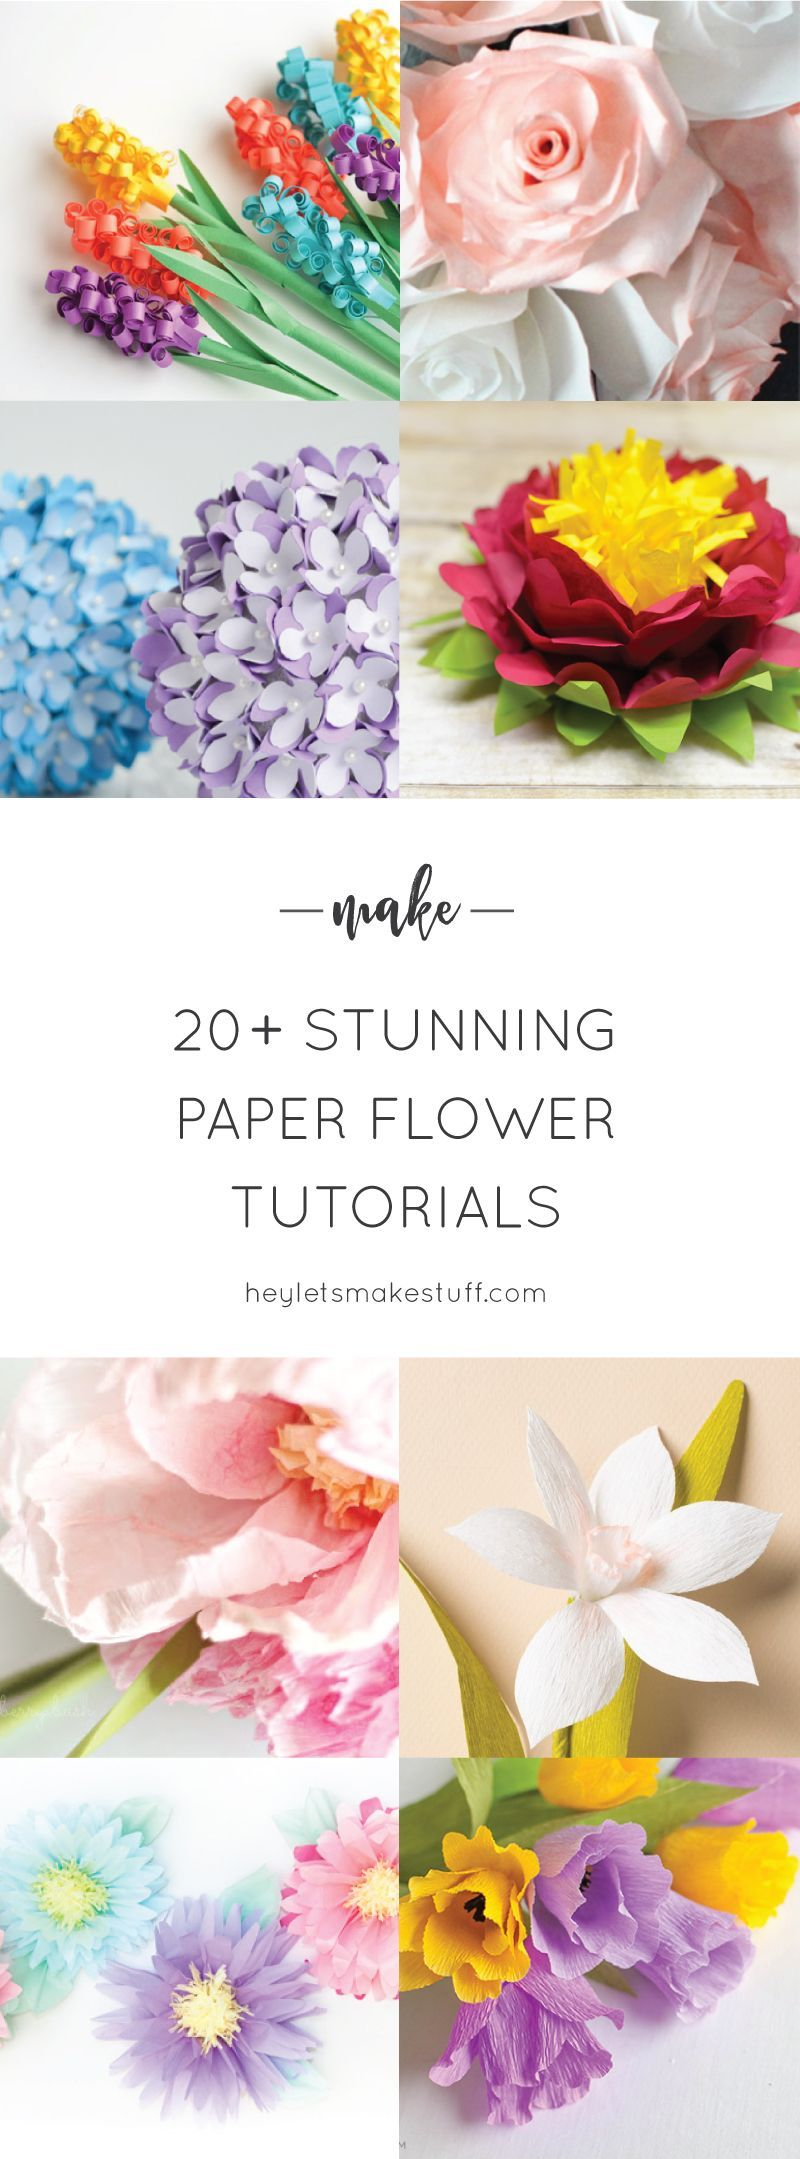 20 Stunning Paper Flower Tutorials Pinterest Paper Flower